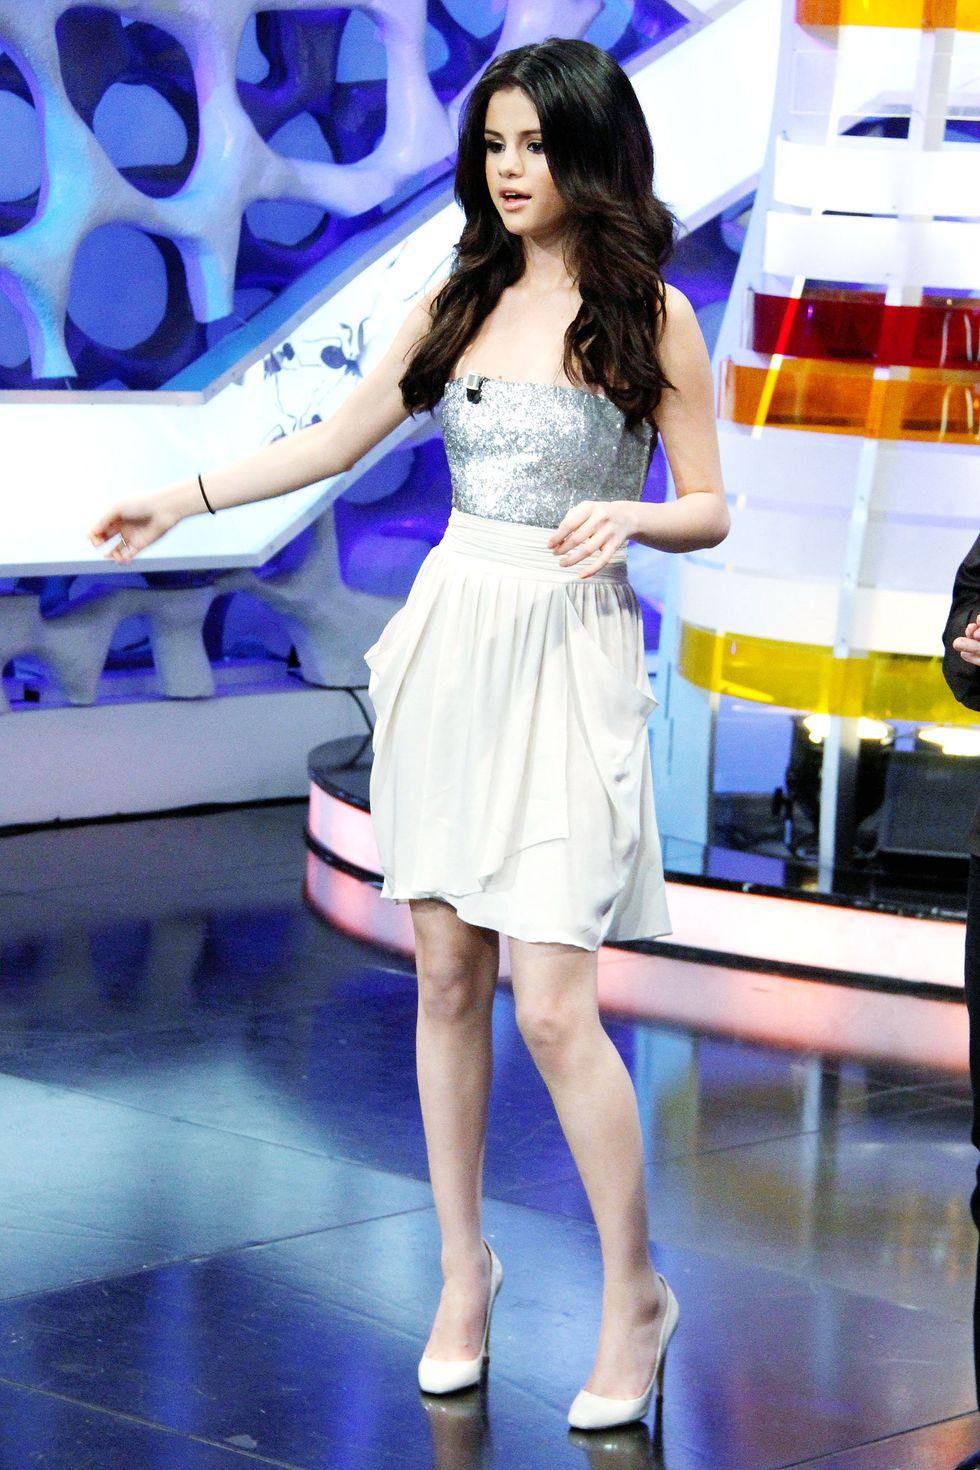 Selena Gomez 2010 : selena-gomez-el-hormiguero-tv-show-stills-hq-02